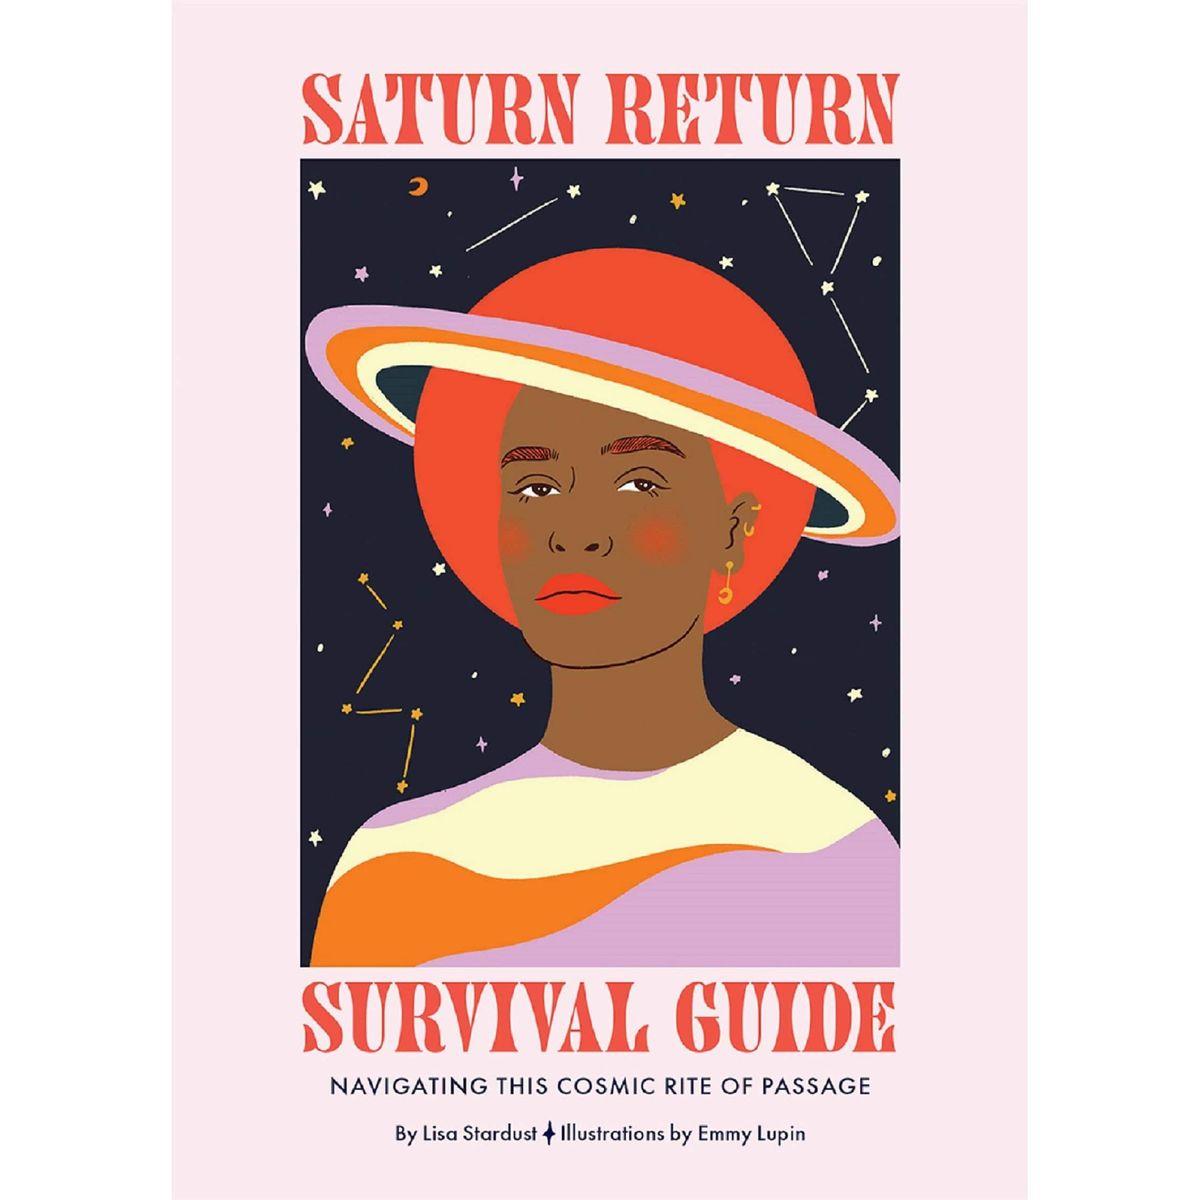 Saturn Return Survival Guide: Navigating this Cosmic Rite of Passage